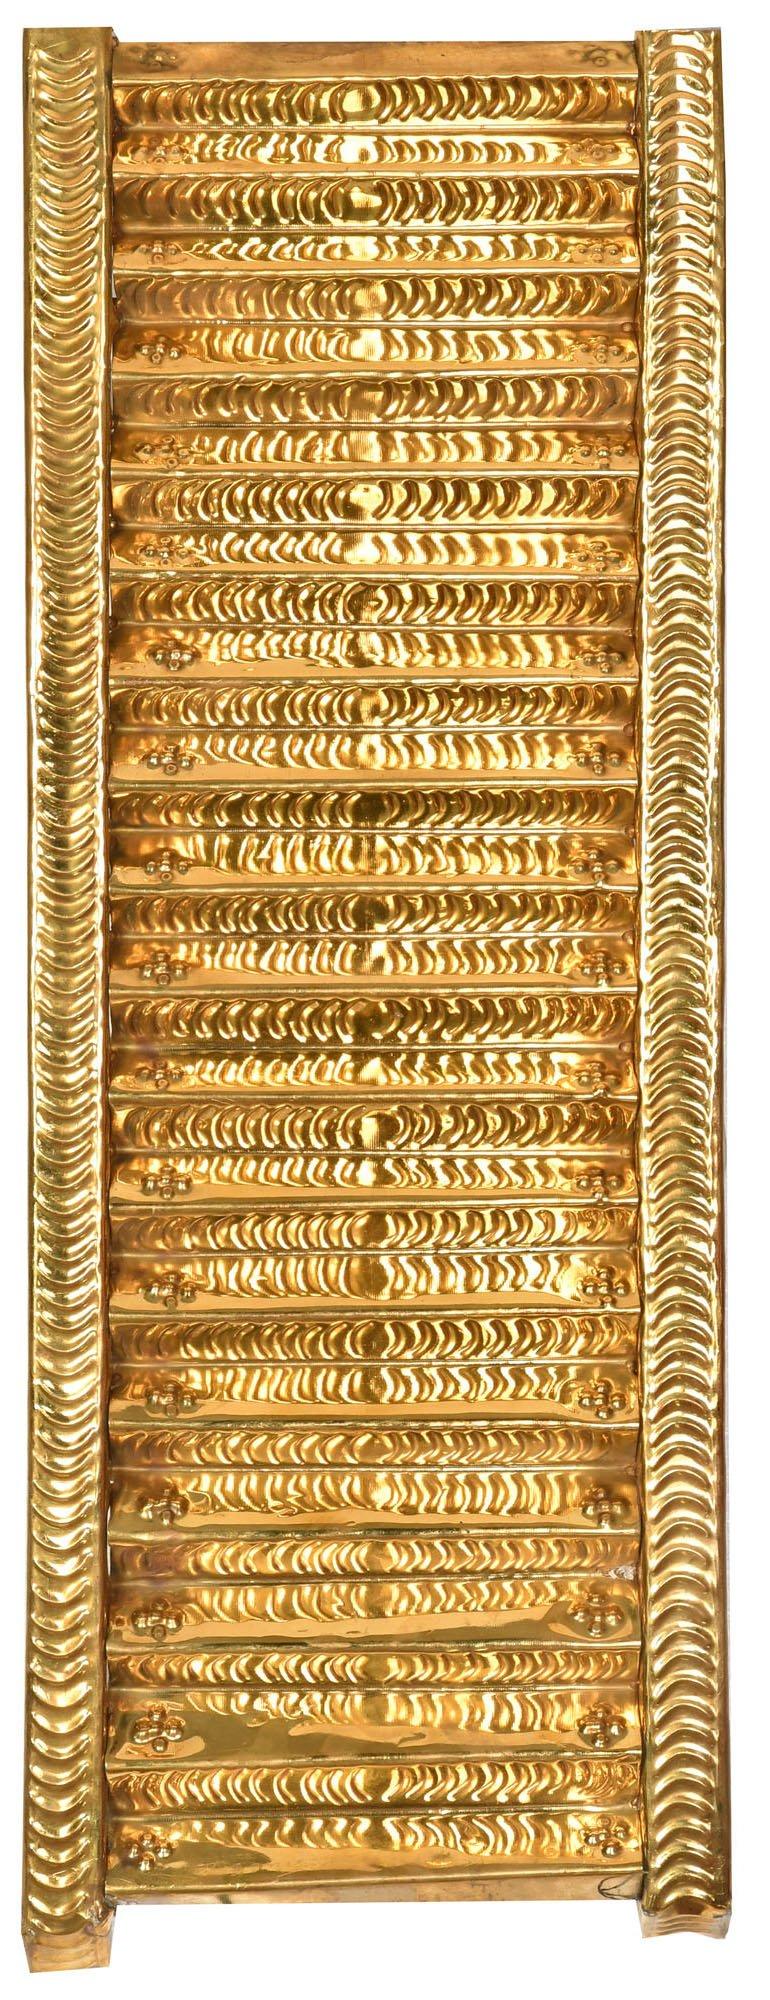 Eighteen Steps of Sabarimala Ayyappa Temple (for Padi Puja) - Brass and Iron Statue